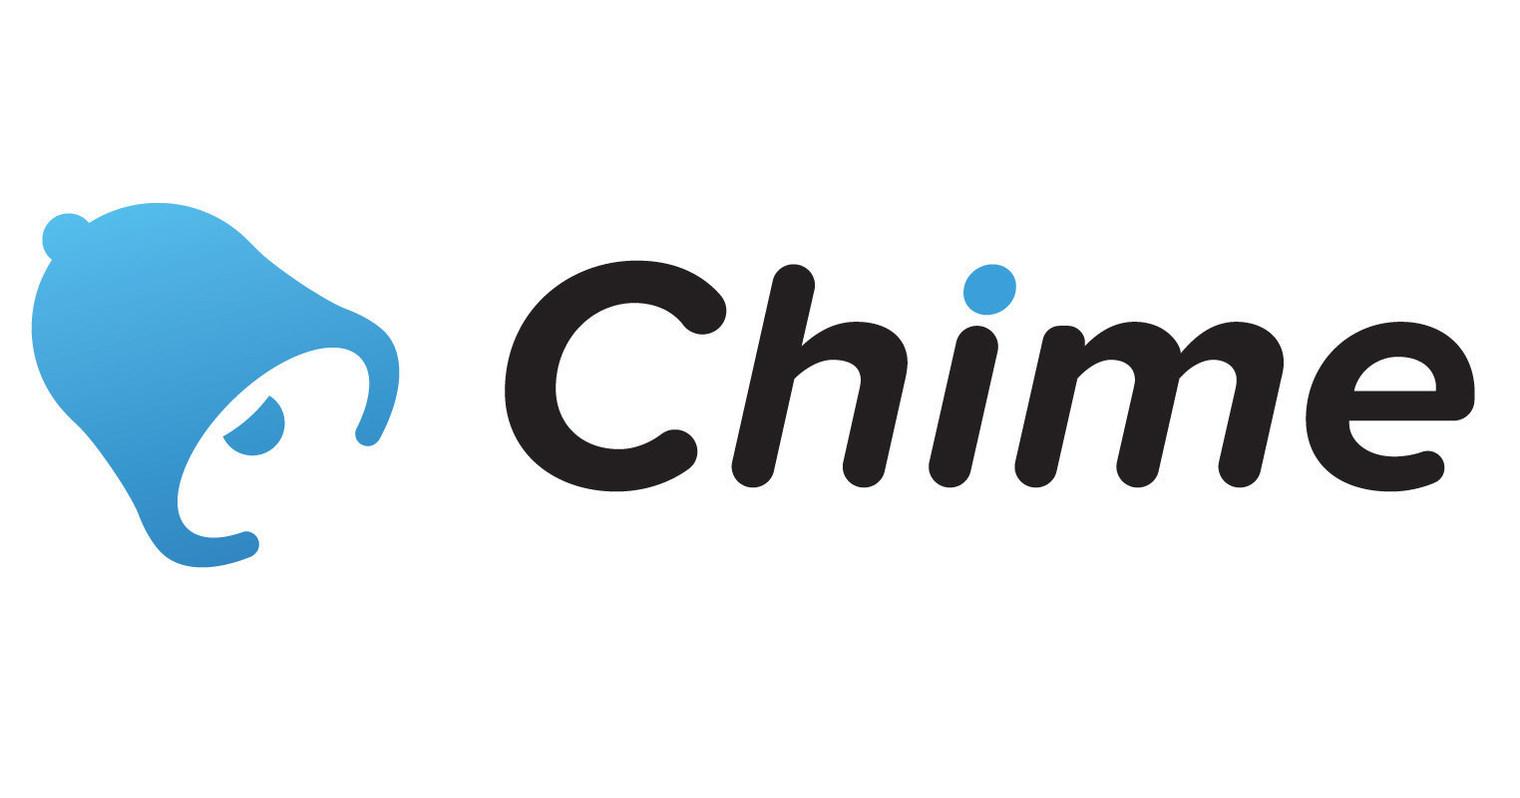 chime - photo #24